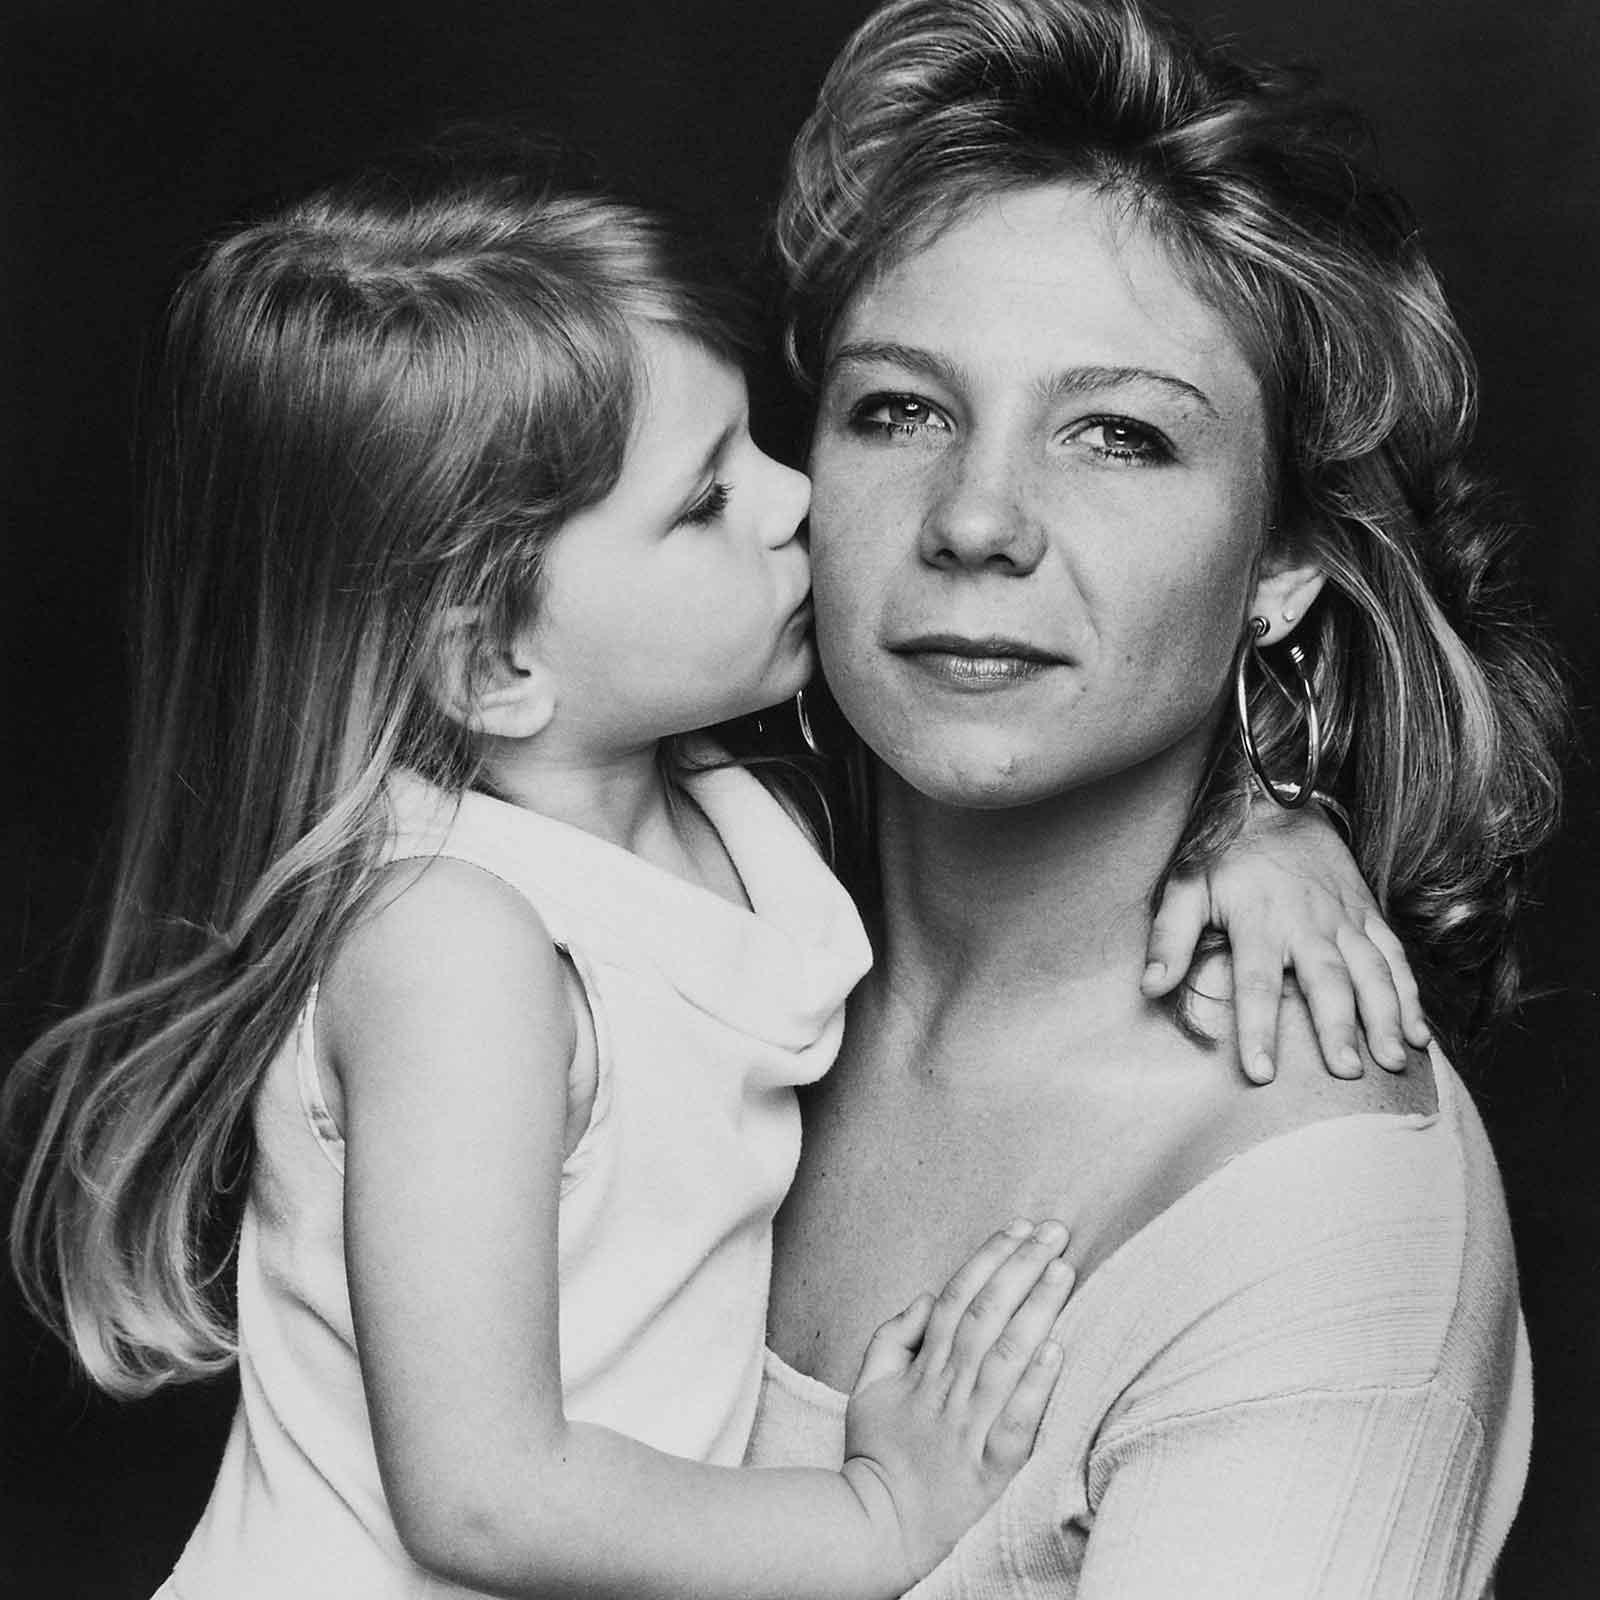 Zoë Lorenz and her daughter